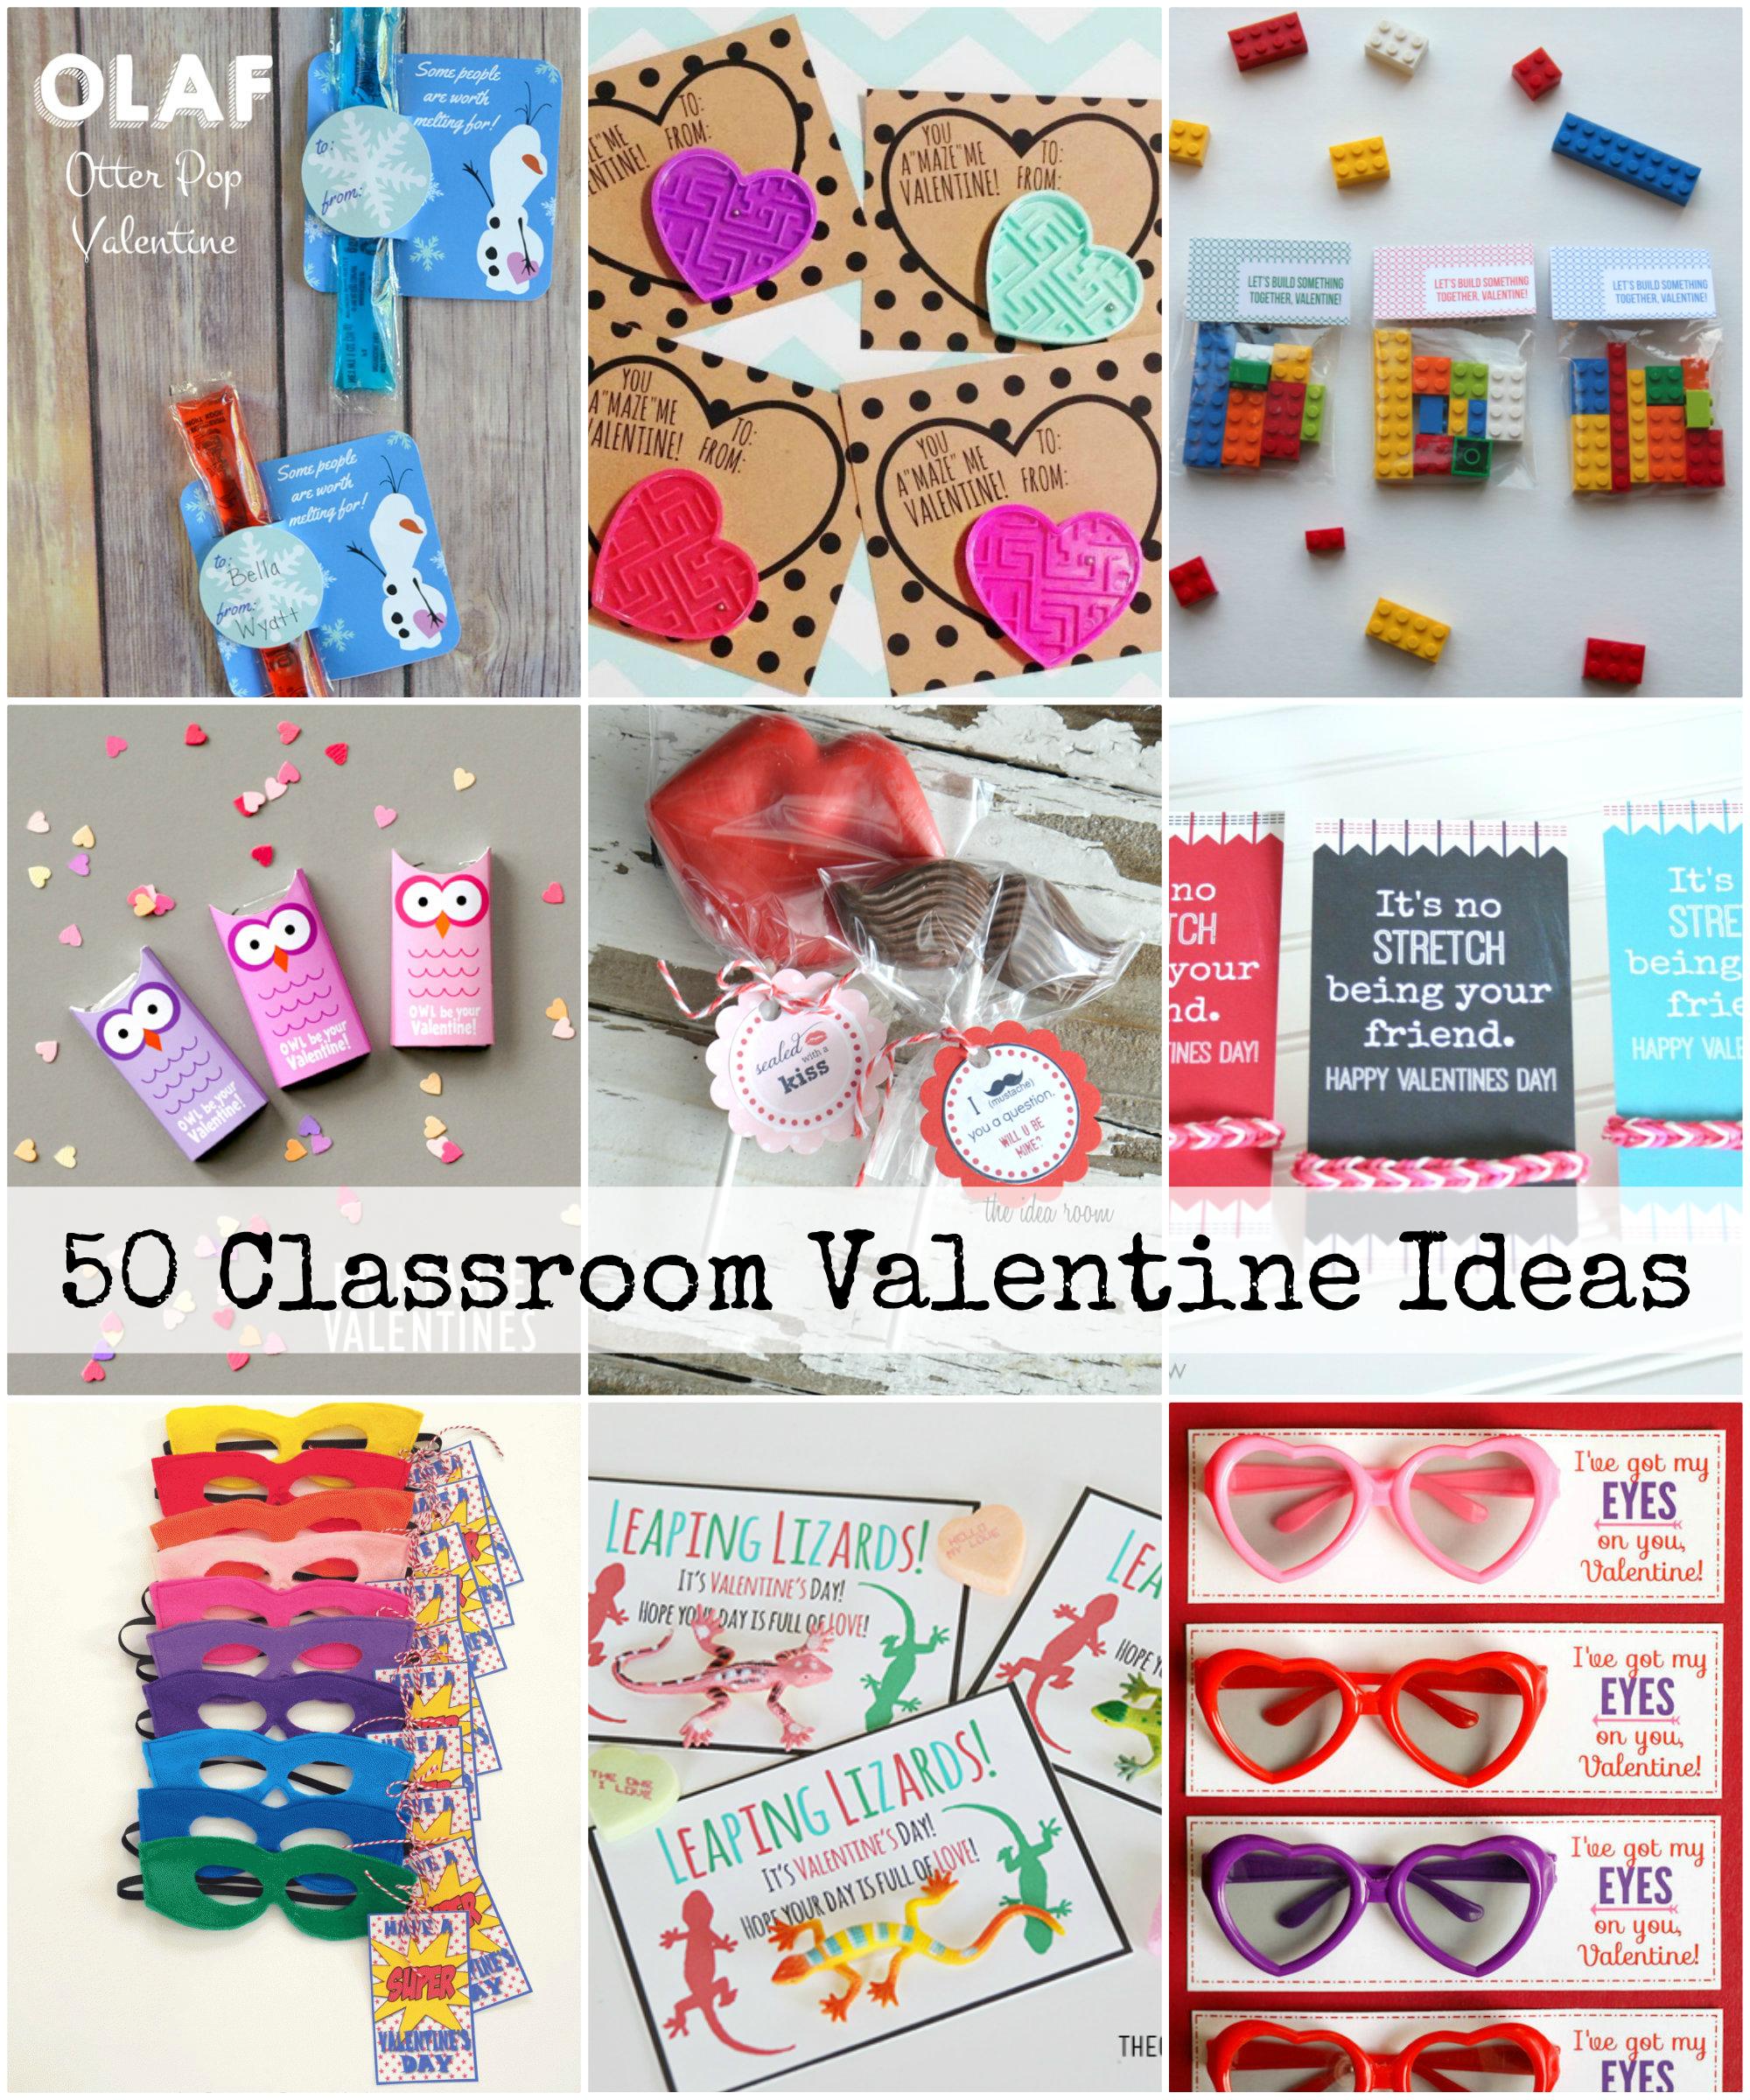 50-Classroom-Valentine-Ideas-Cover (2)